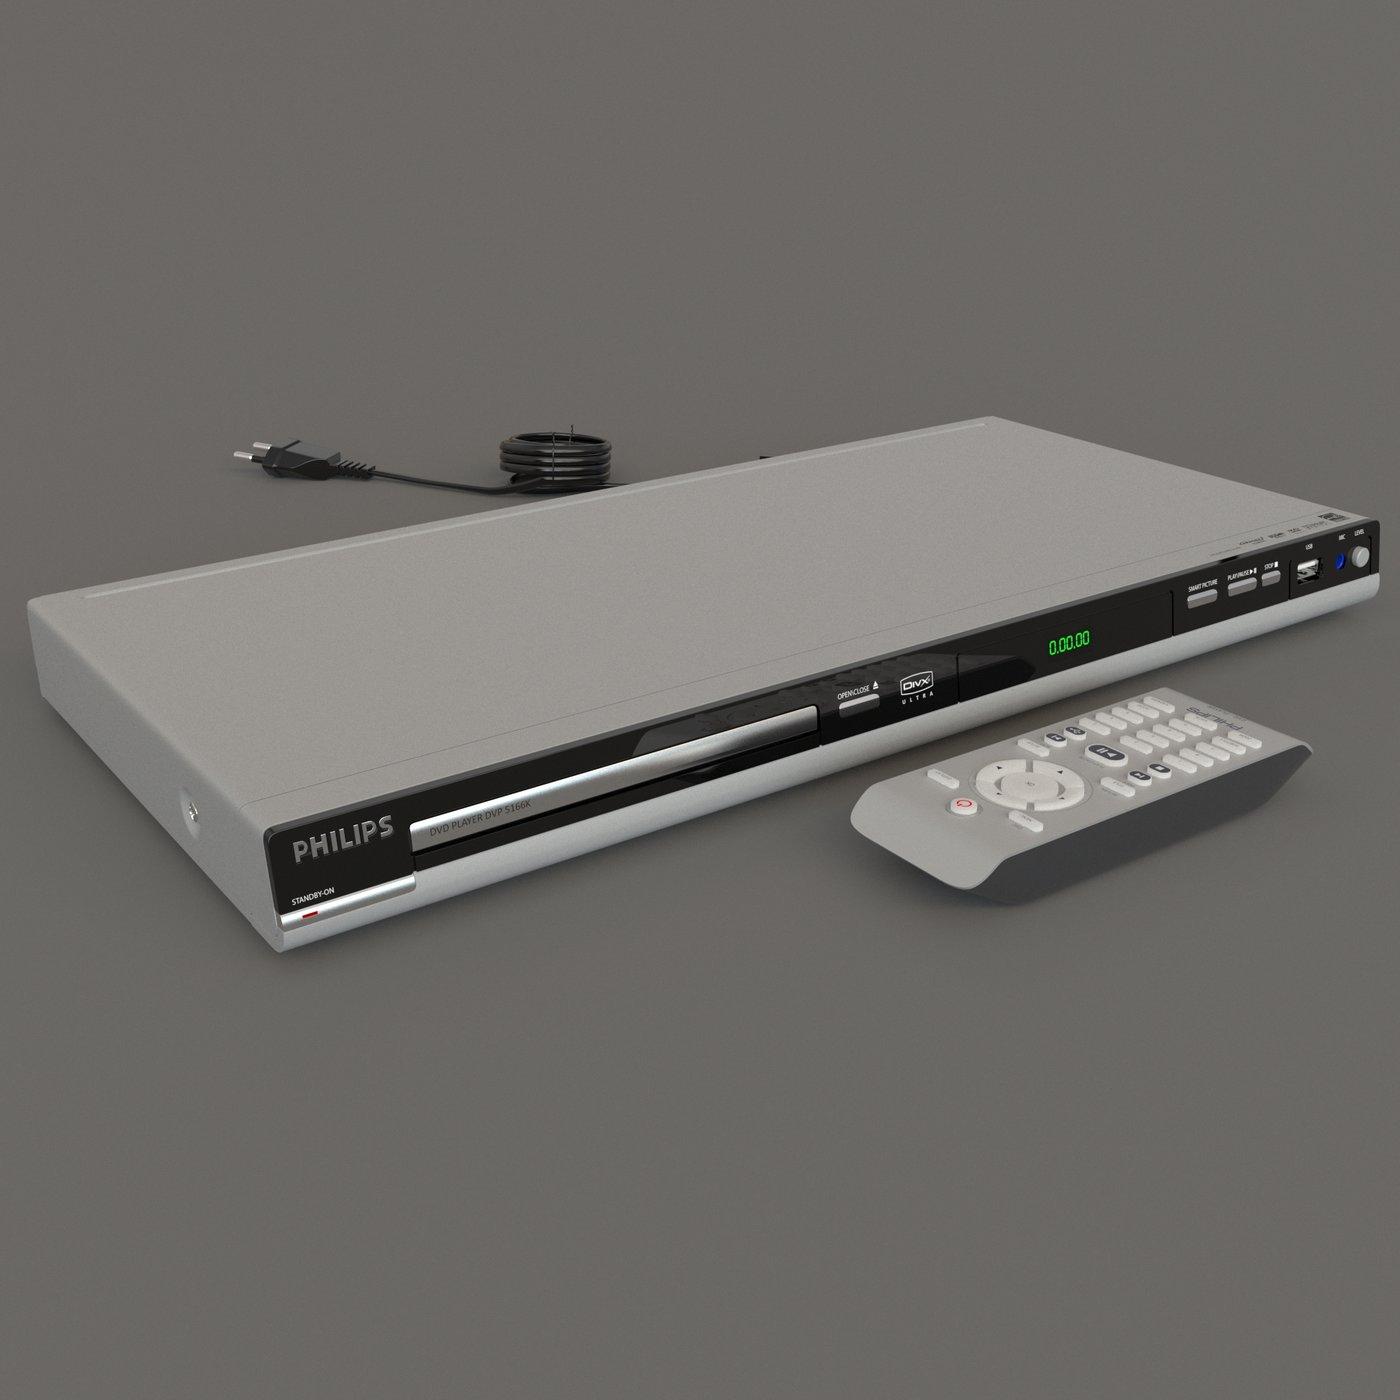 Philips DVD Player DVP 5166K